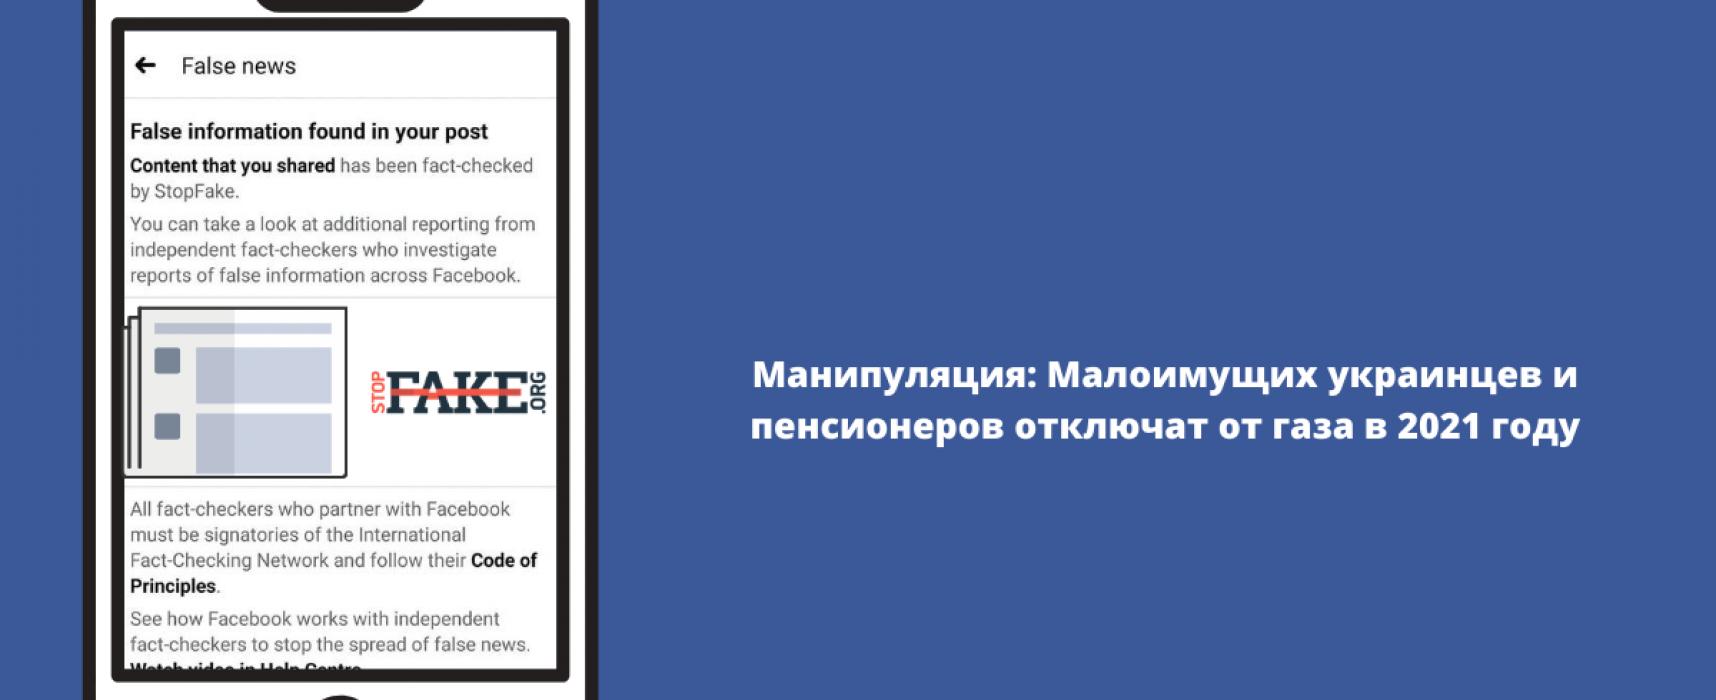 Манипуляция: Малоимущих украинцев и пенсионеров отключат от газа в 2021 году